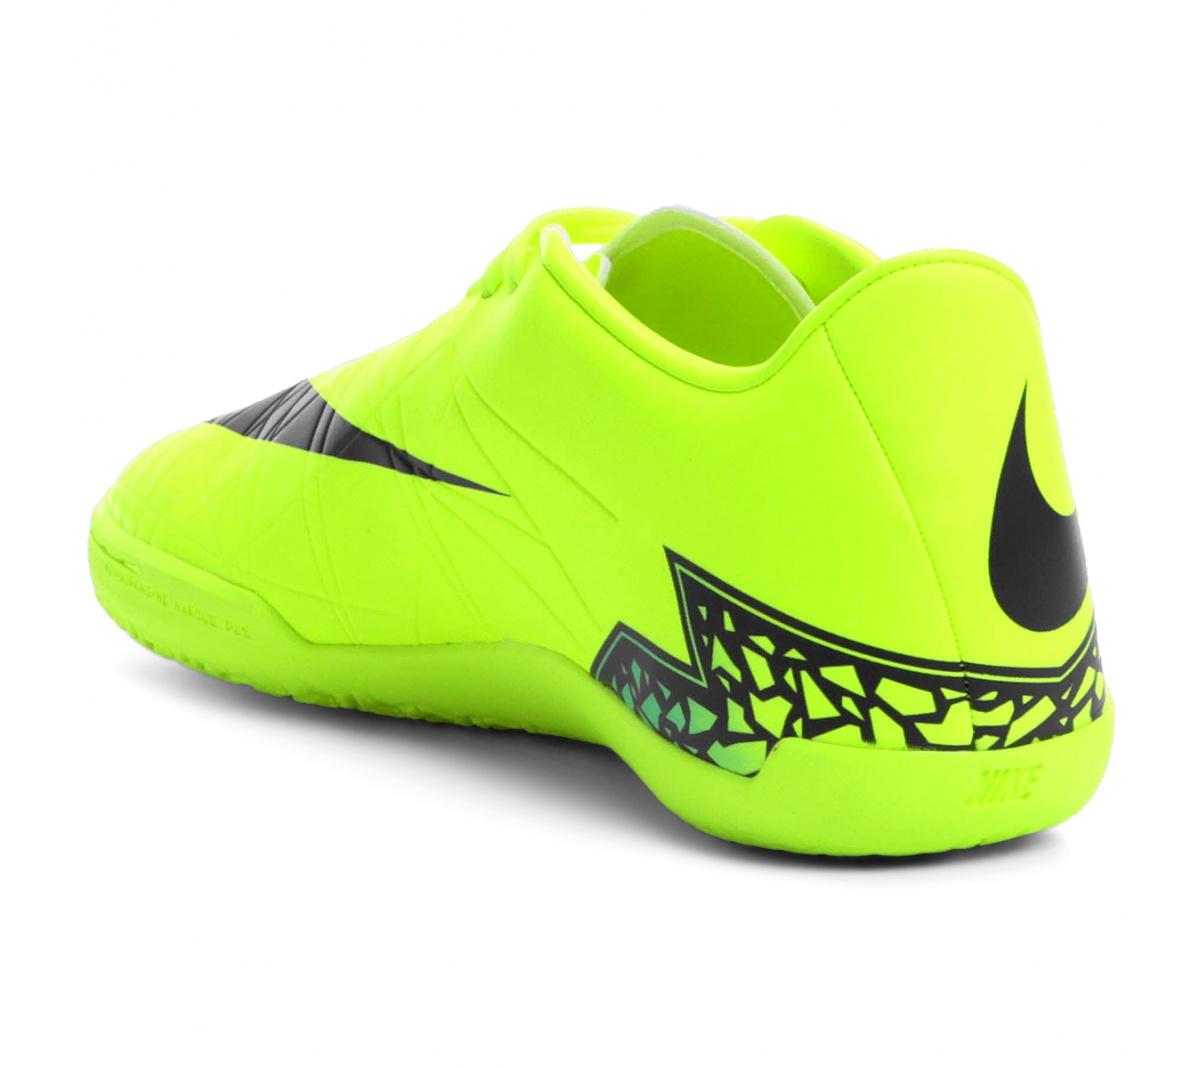 ddac4d387aa2b Tênis Nike Hypervenom Phelon II Futsal Infantil - Mundo do Futebol